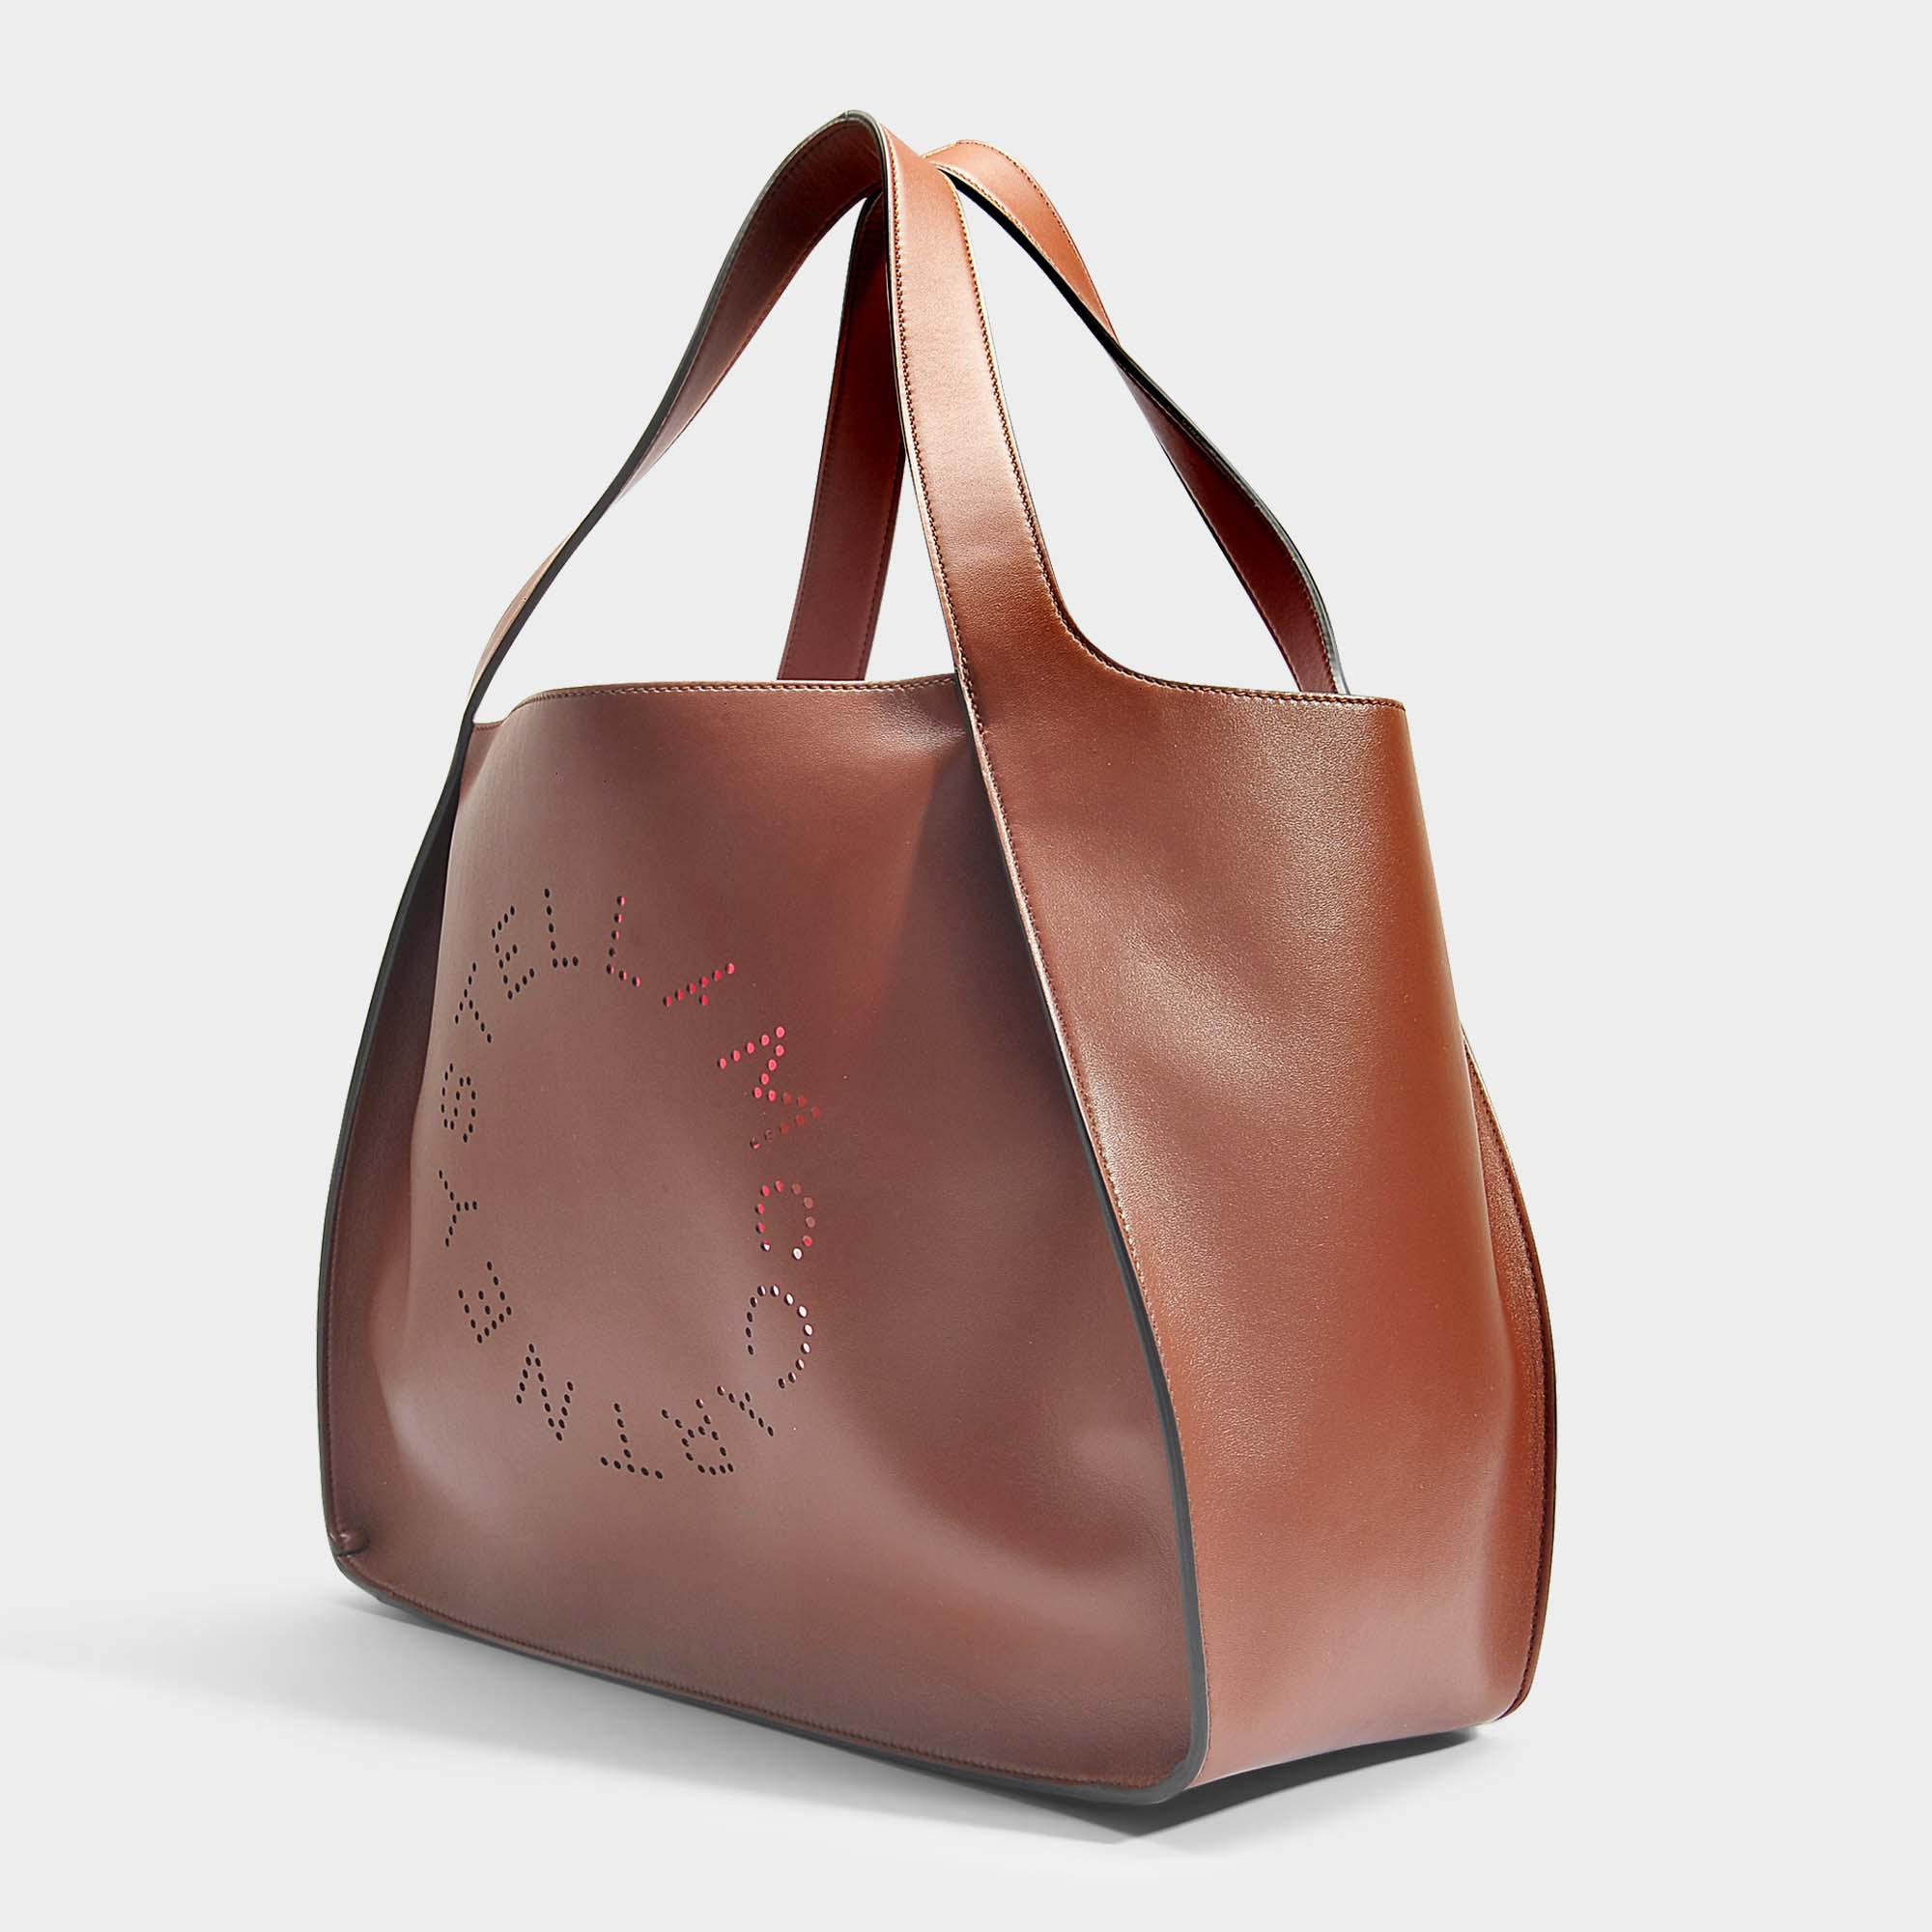 Alter Nappa Stella Logo Tote Bag in Pecan Eco Fabric Stella McCartney 05dOJIEhG